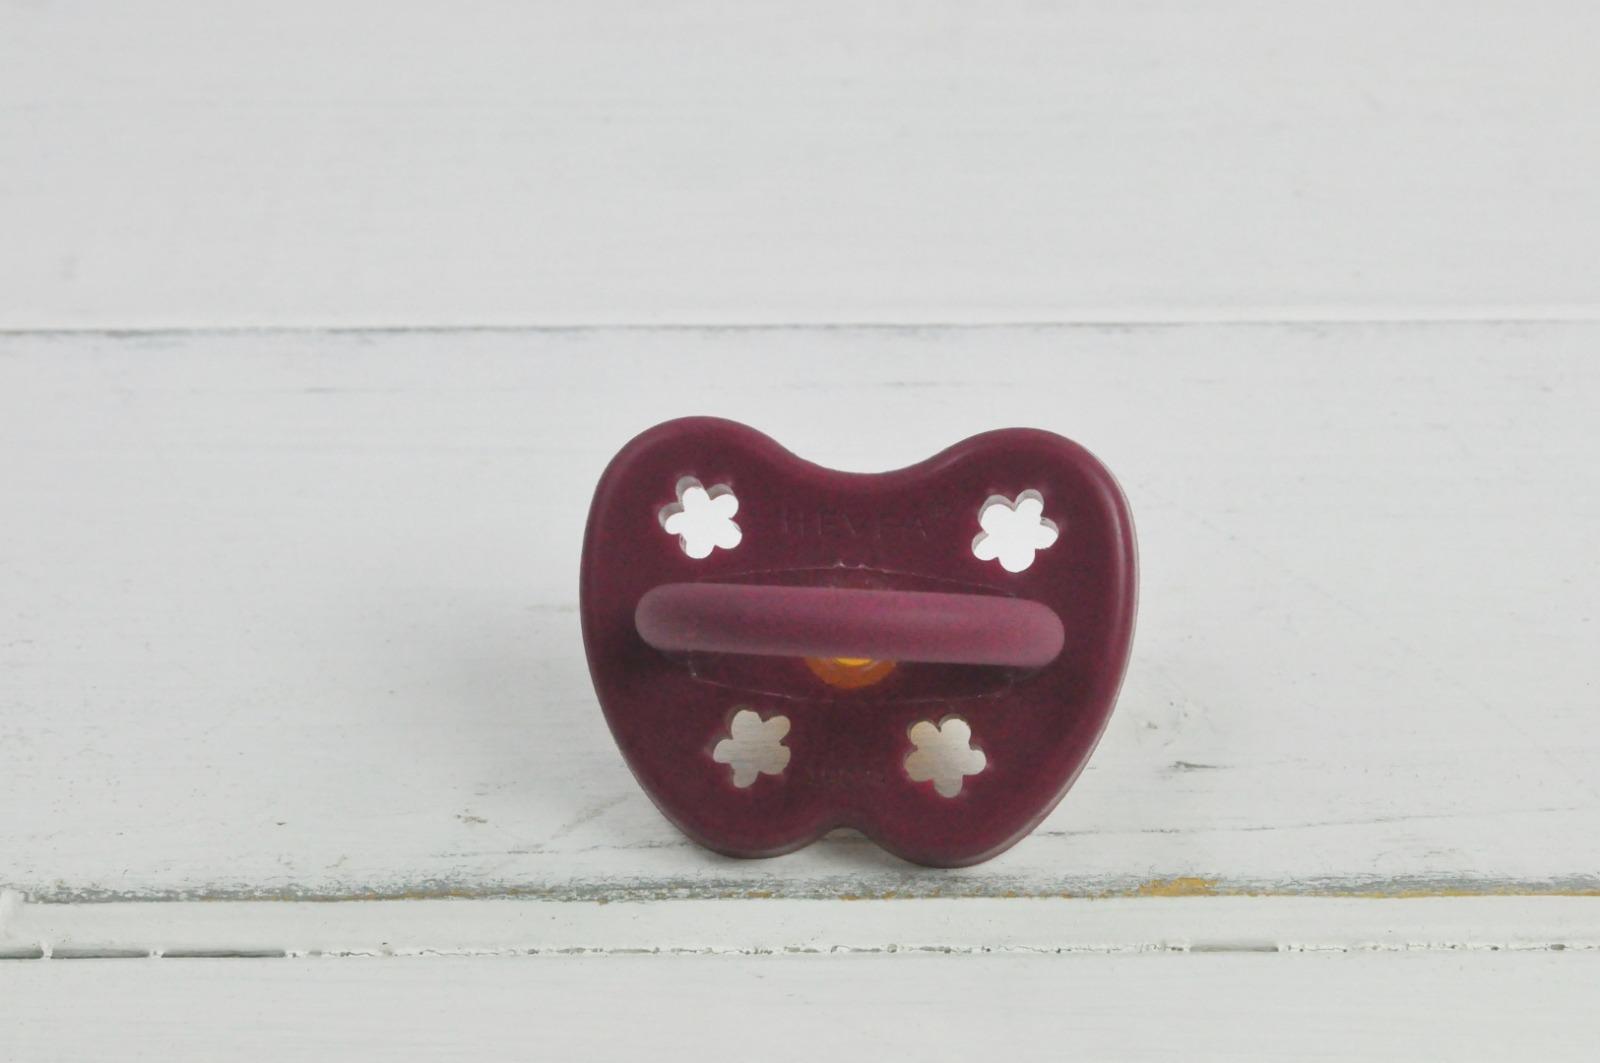 Schnuller Kautschuk Hevea kiefergerecht Blume Monate